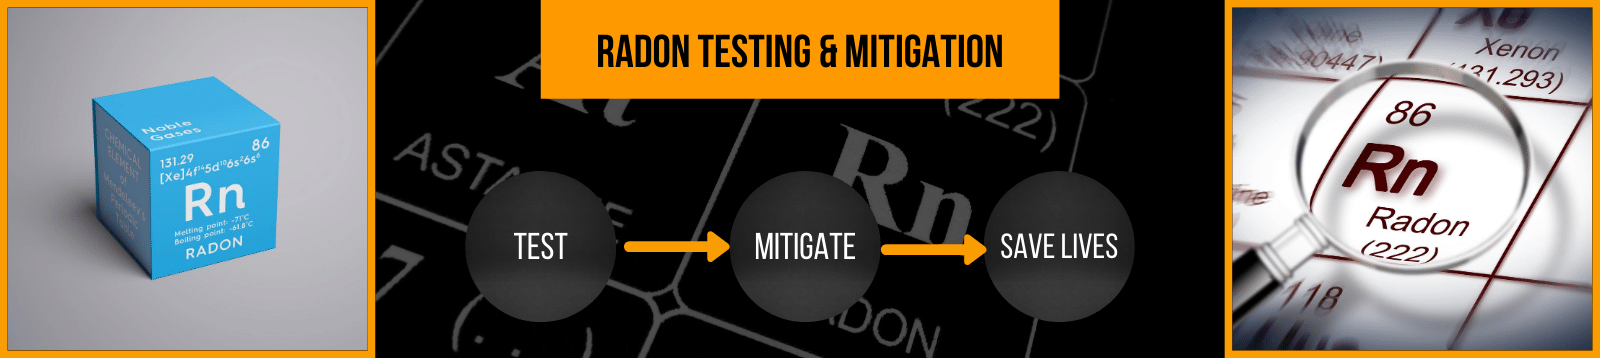 Radon testing and mitigation for Omaha, NE and Western Iowa